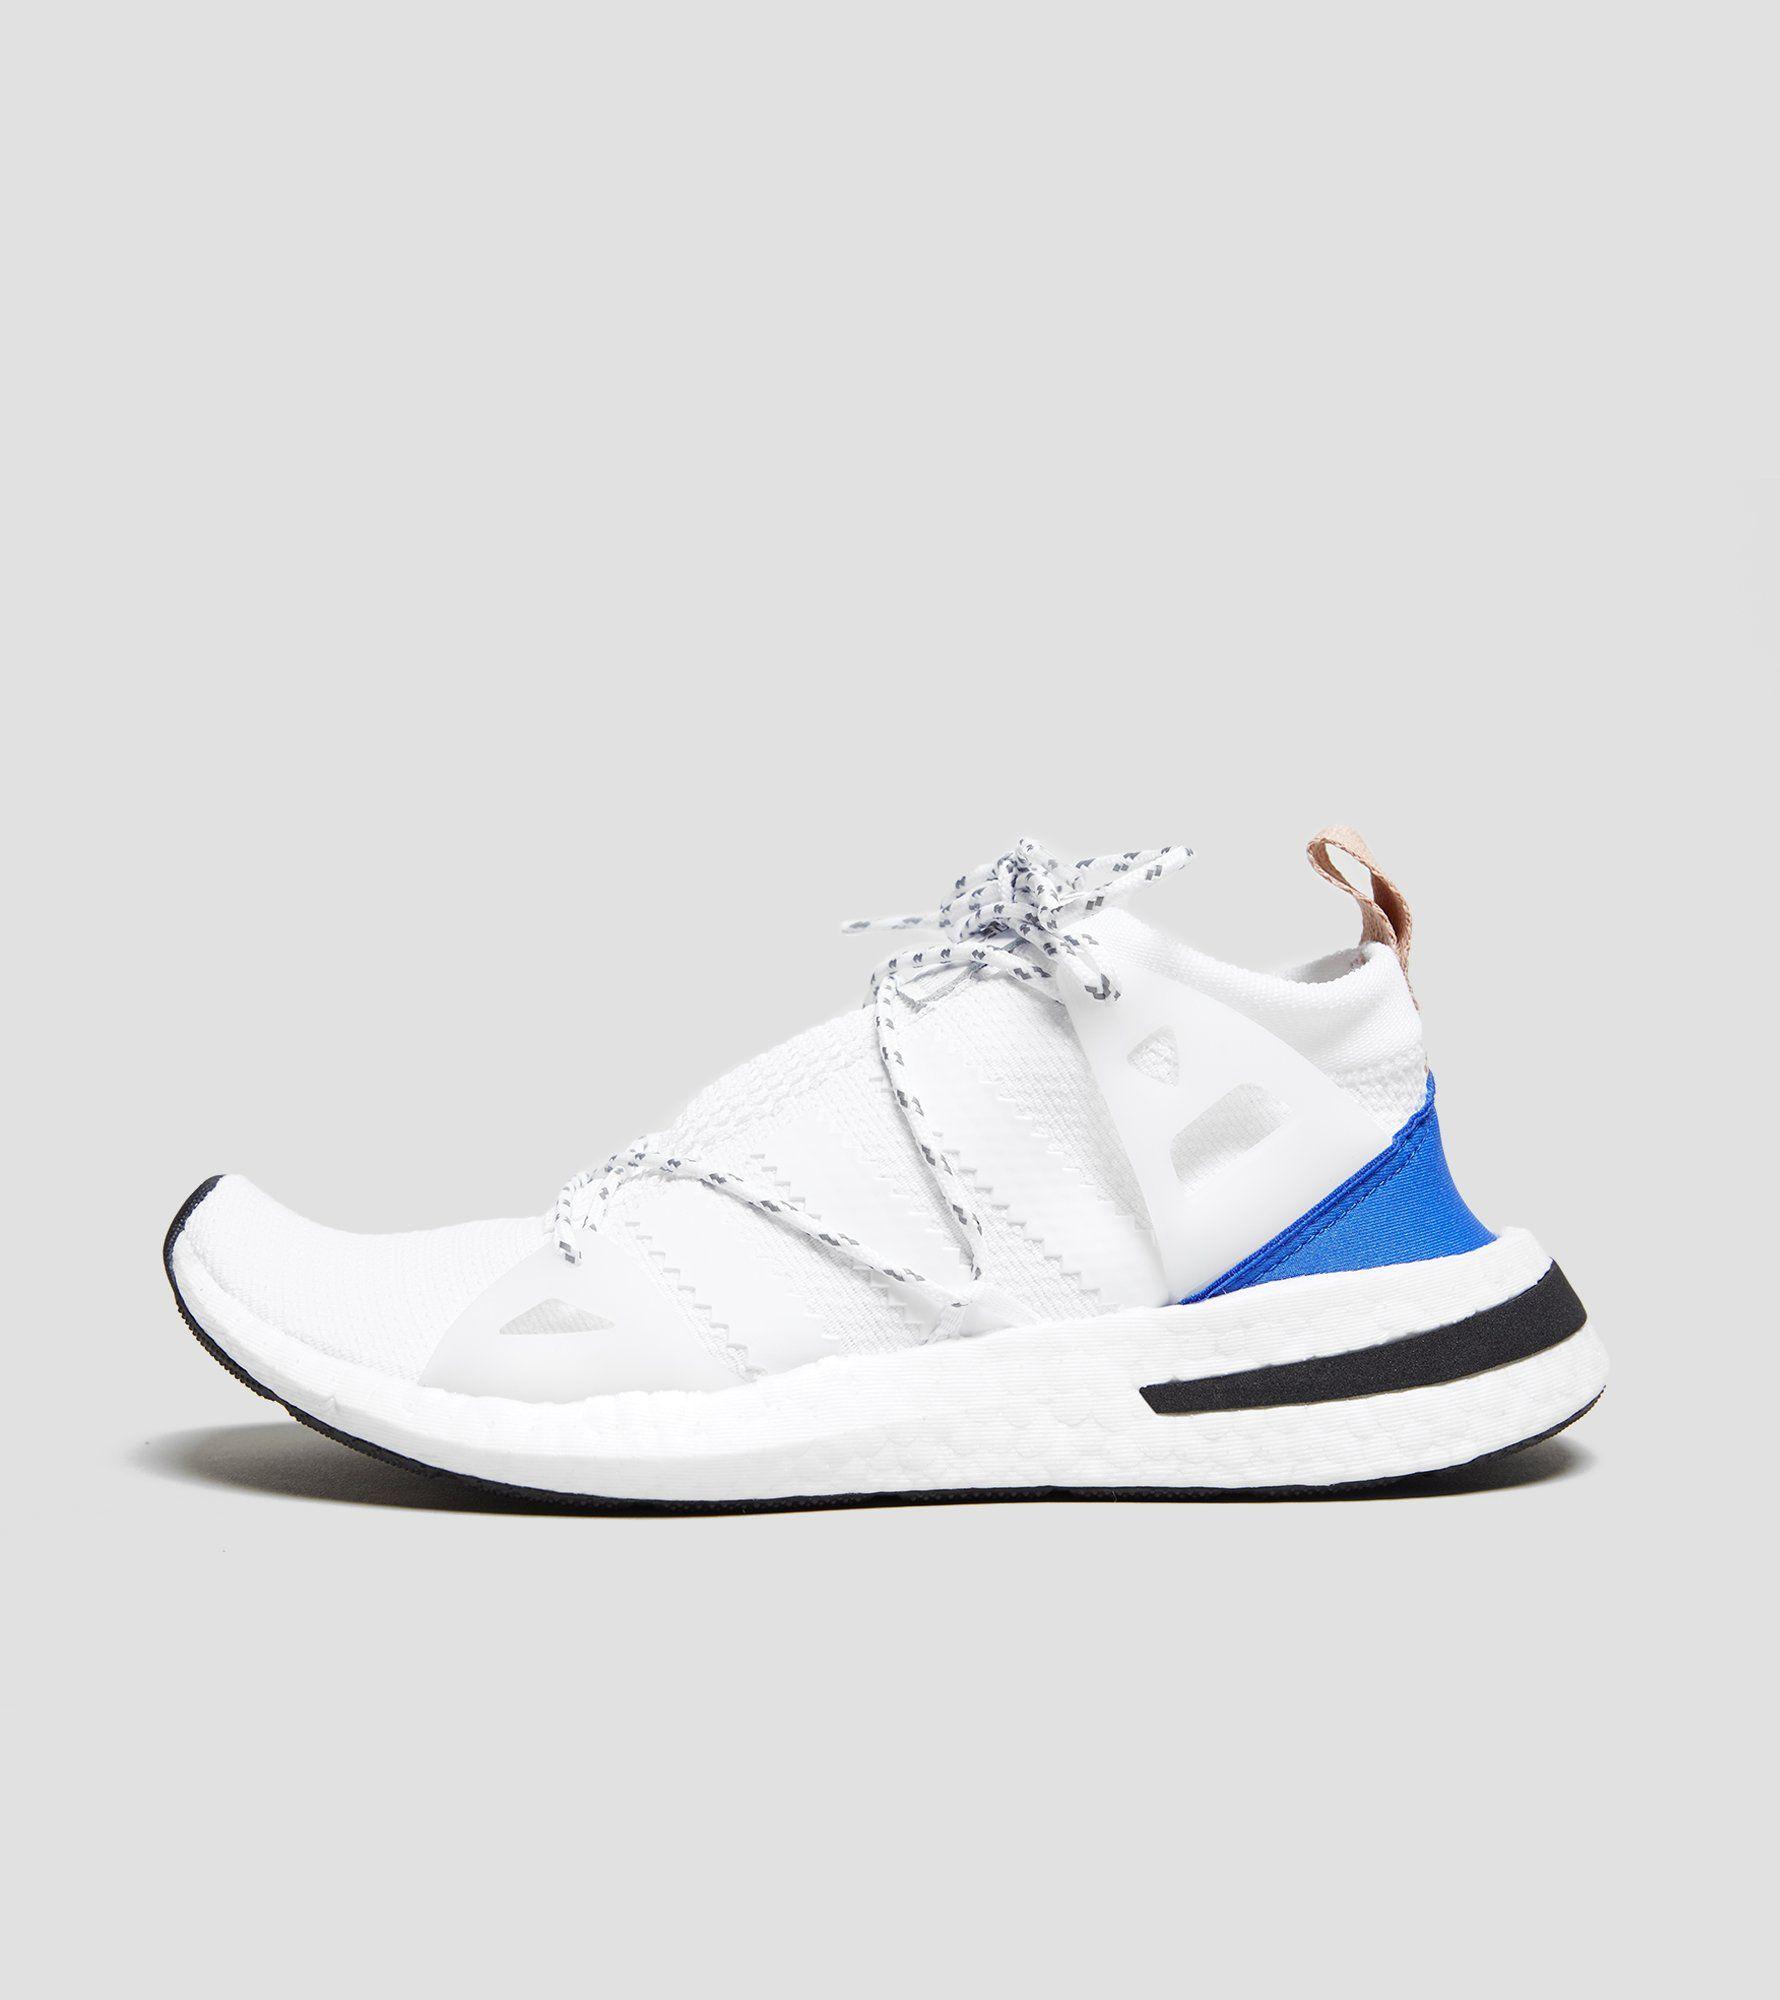 Arkyn W - Chaussures De Sport Pour Hommes Adidas / Blanc